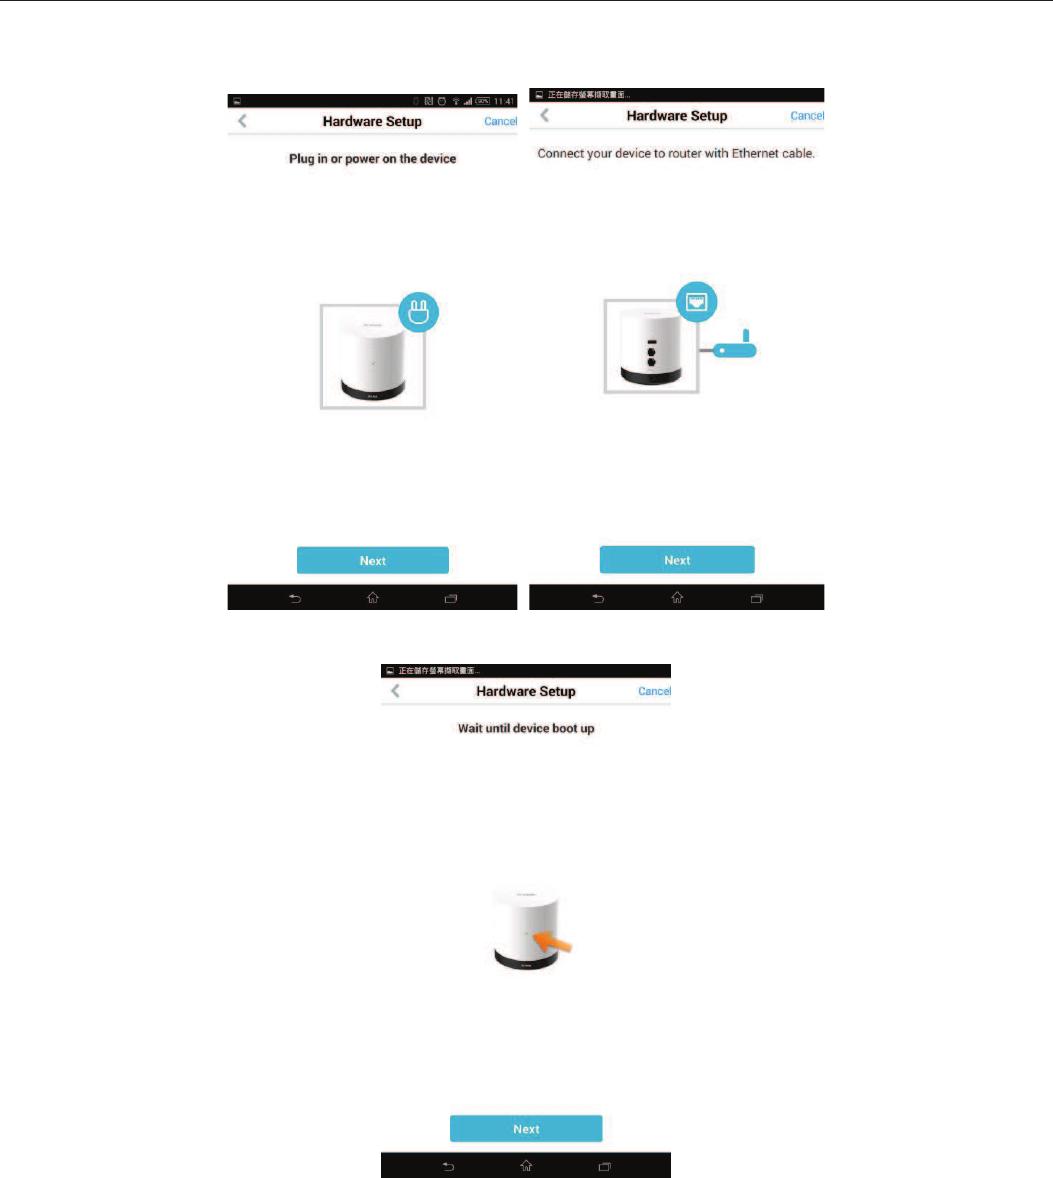 D Link CHG020A1 mydlinkTM Connected Home Hub, Smart home